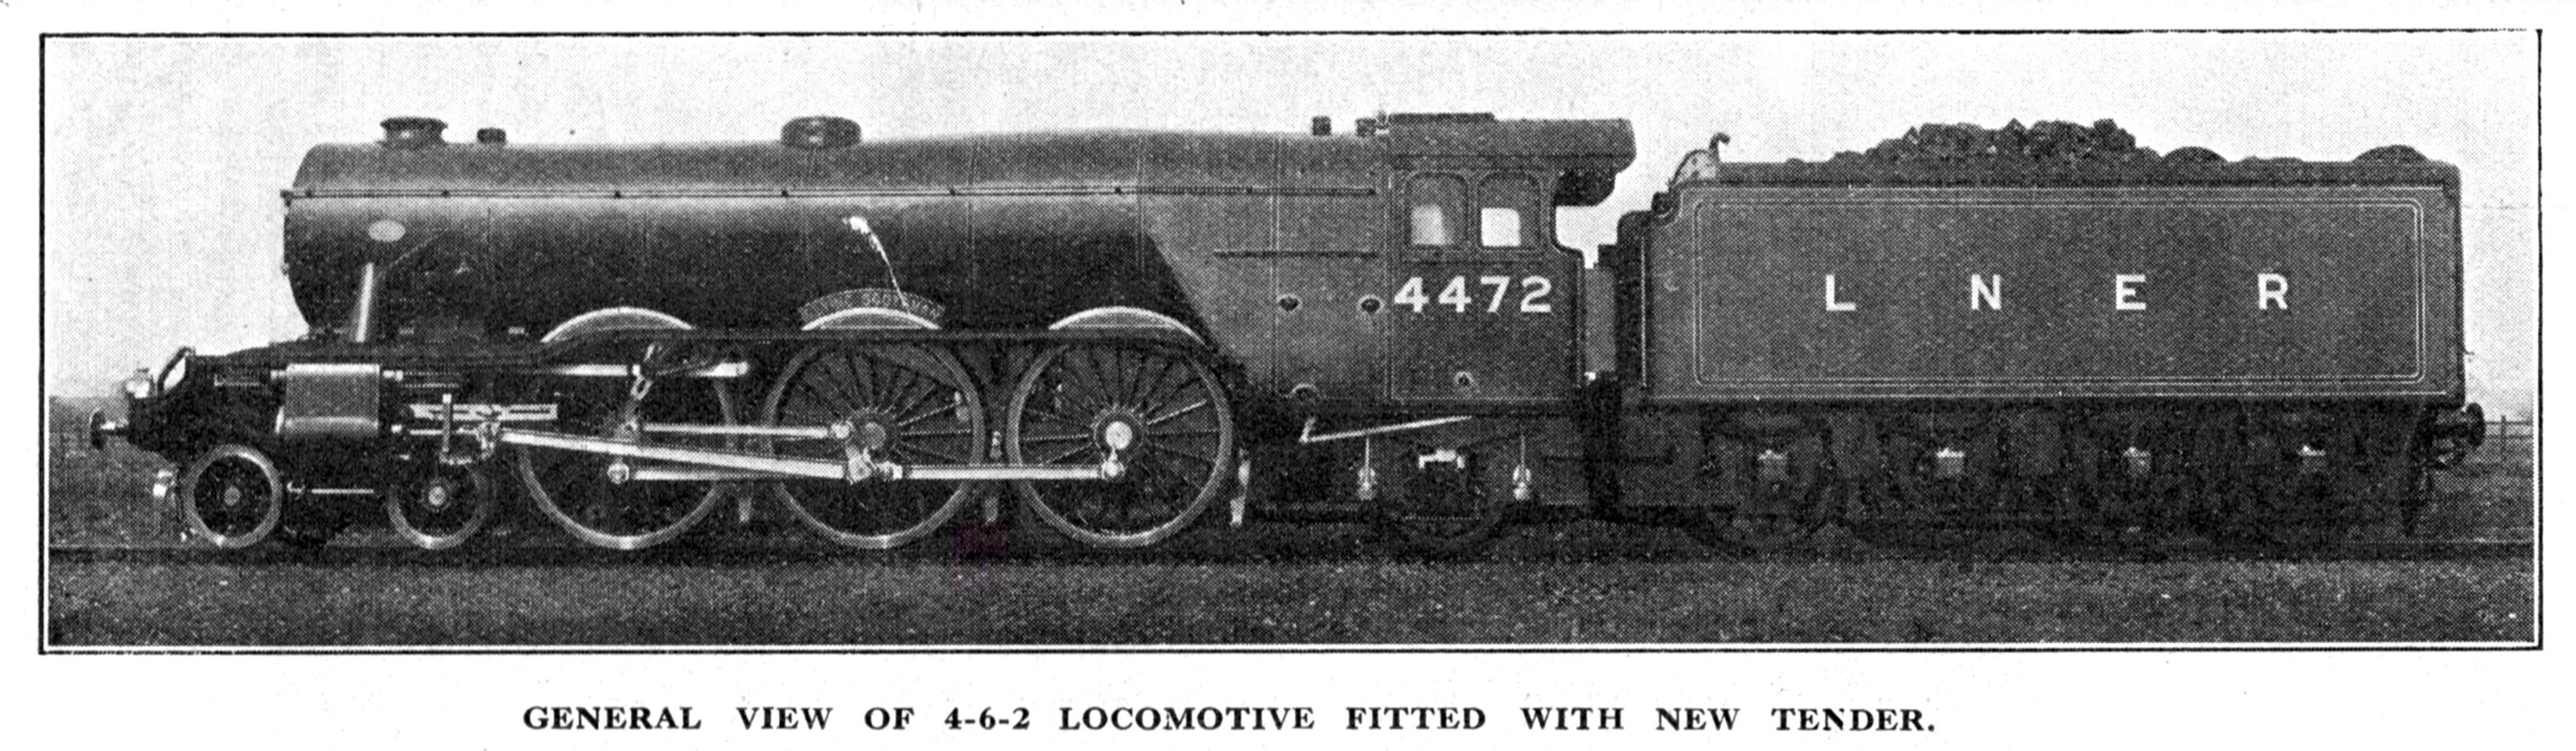 Steam Engine Locomotive Diagram Flying Scotsman Gresley A1 A3 Steam Lo Otive 1923 Lner Br Of Steam Engine Locomotive Diagram